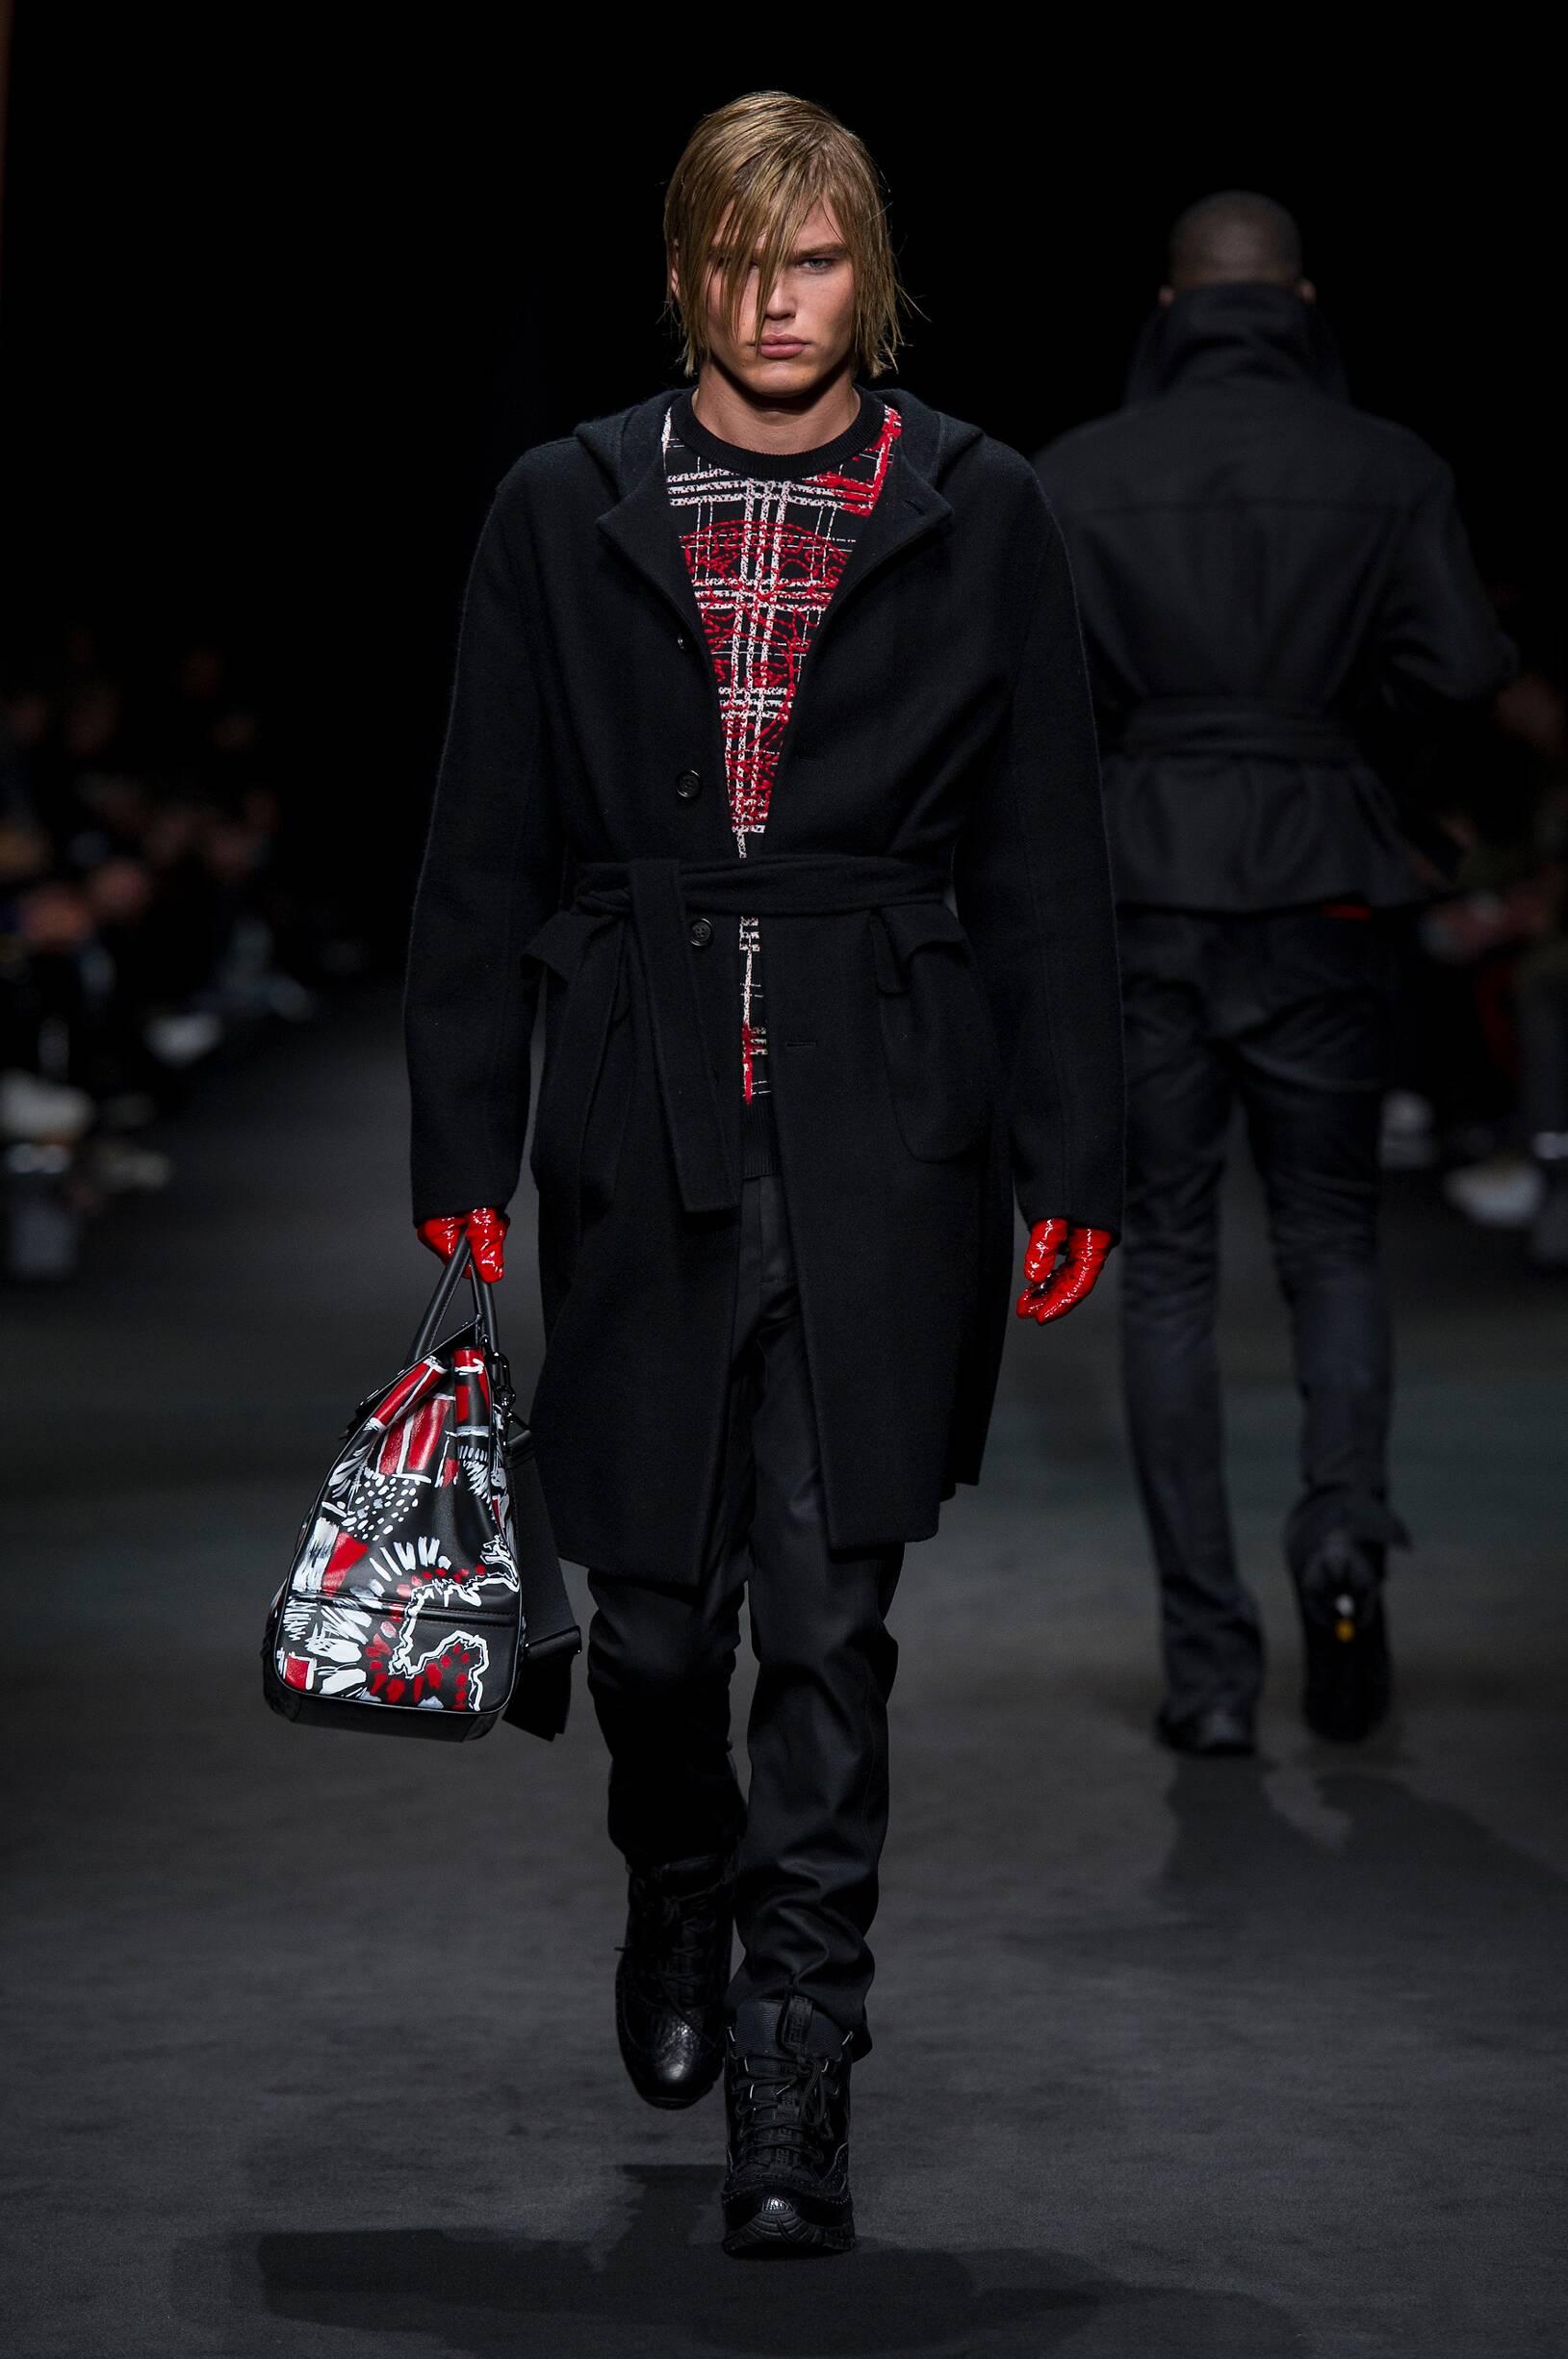 Catwalk Versace Man Fashion Show Winter 2017